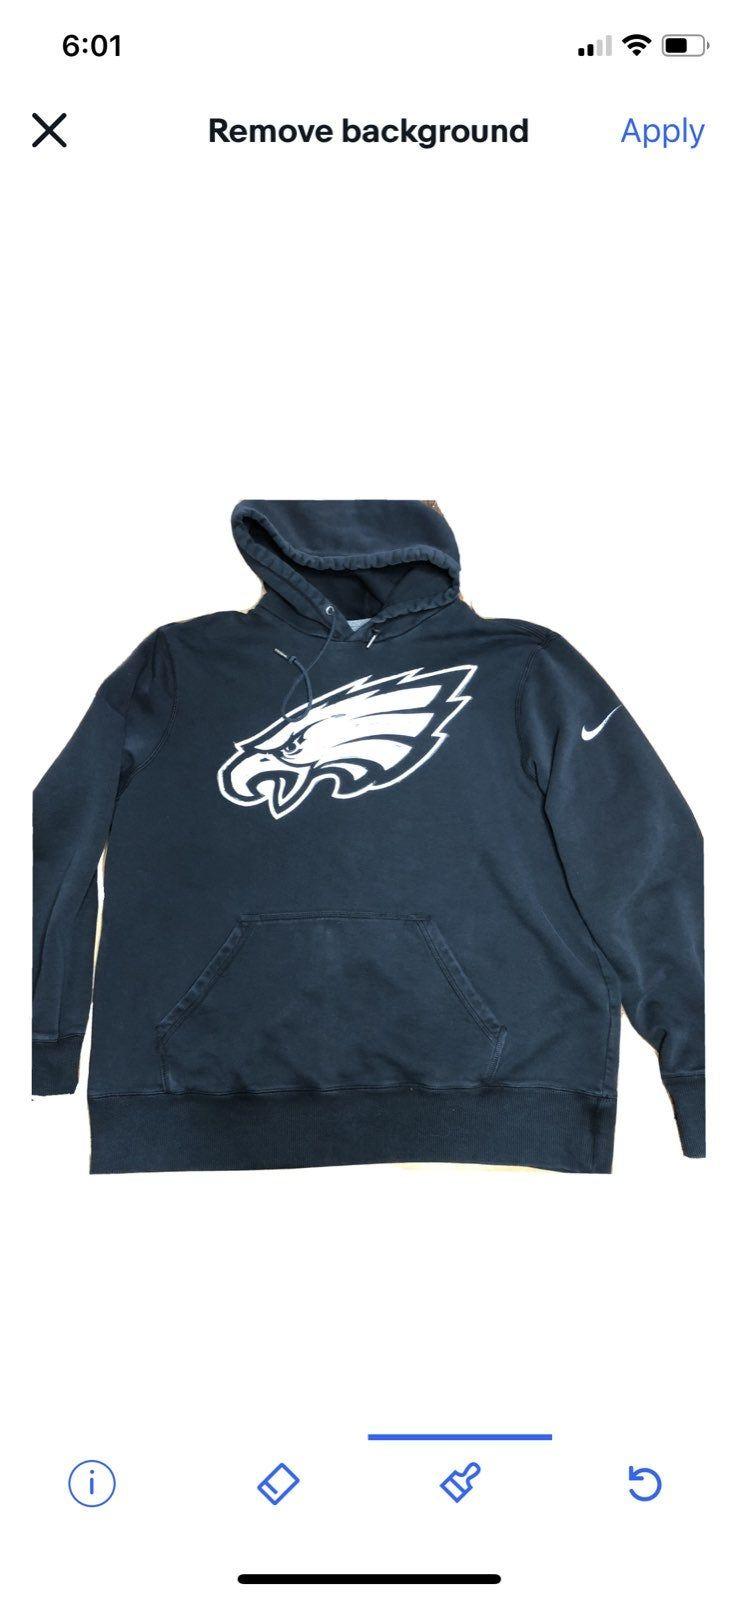 Nike Nfl Philadelphia Eagles Classic Hoodie Sweatshirt Black Tagged Men S Xl Could Fit Large 80 Cotton 20 Philadelphia Eagles Hoodie Hoodies Nike Nfl [ 1600 x 738 Pixel ]